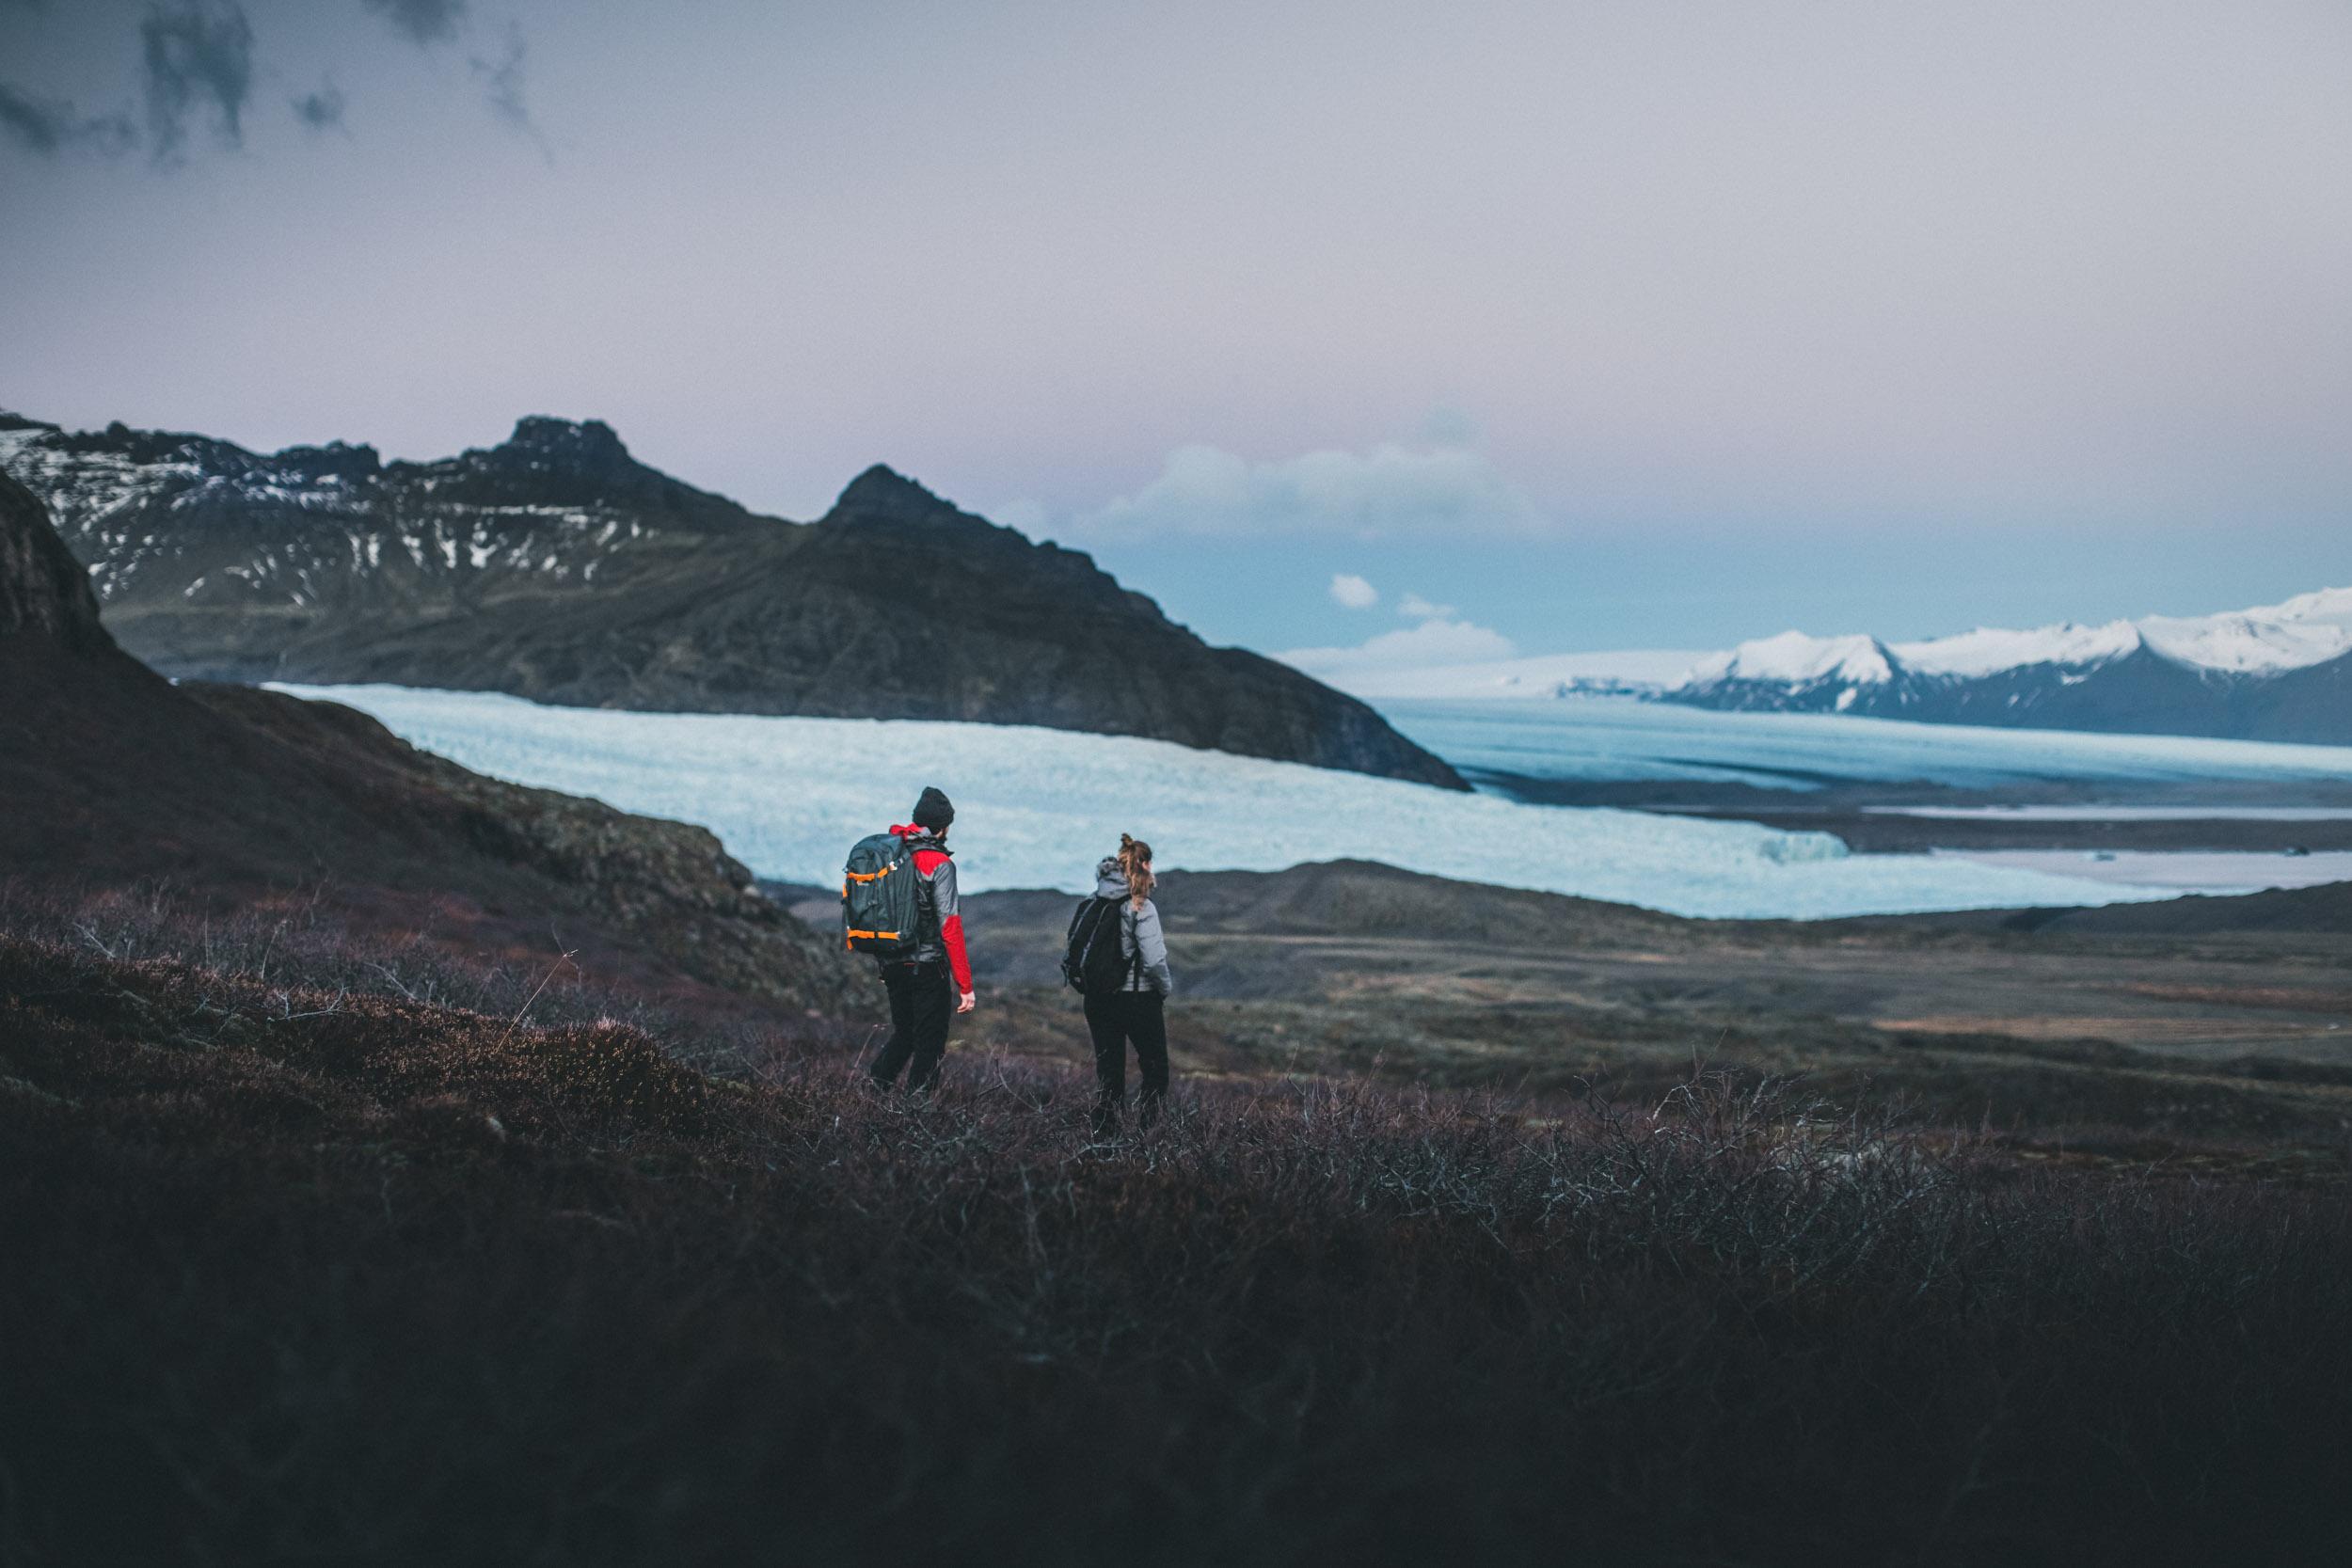 Iceland_Jan_2019_ByTomKahler_Lowres (125 of 262).jpg